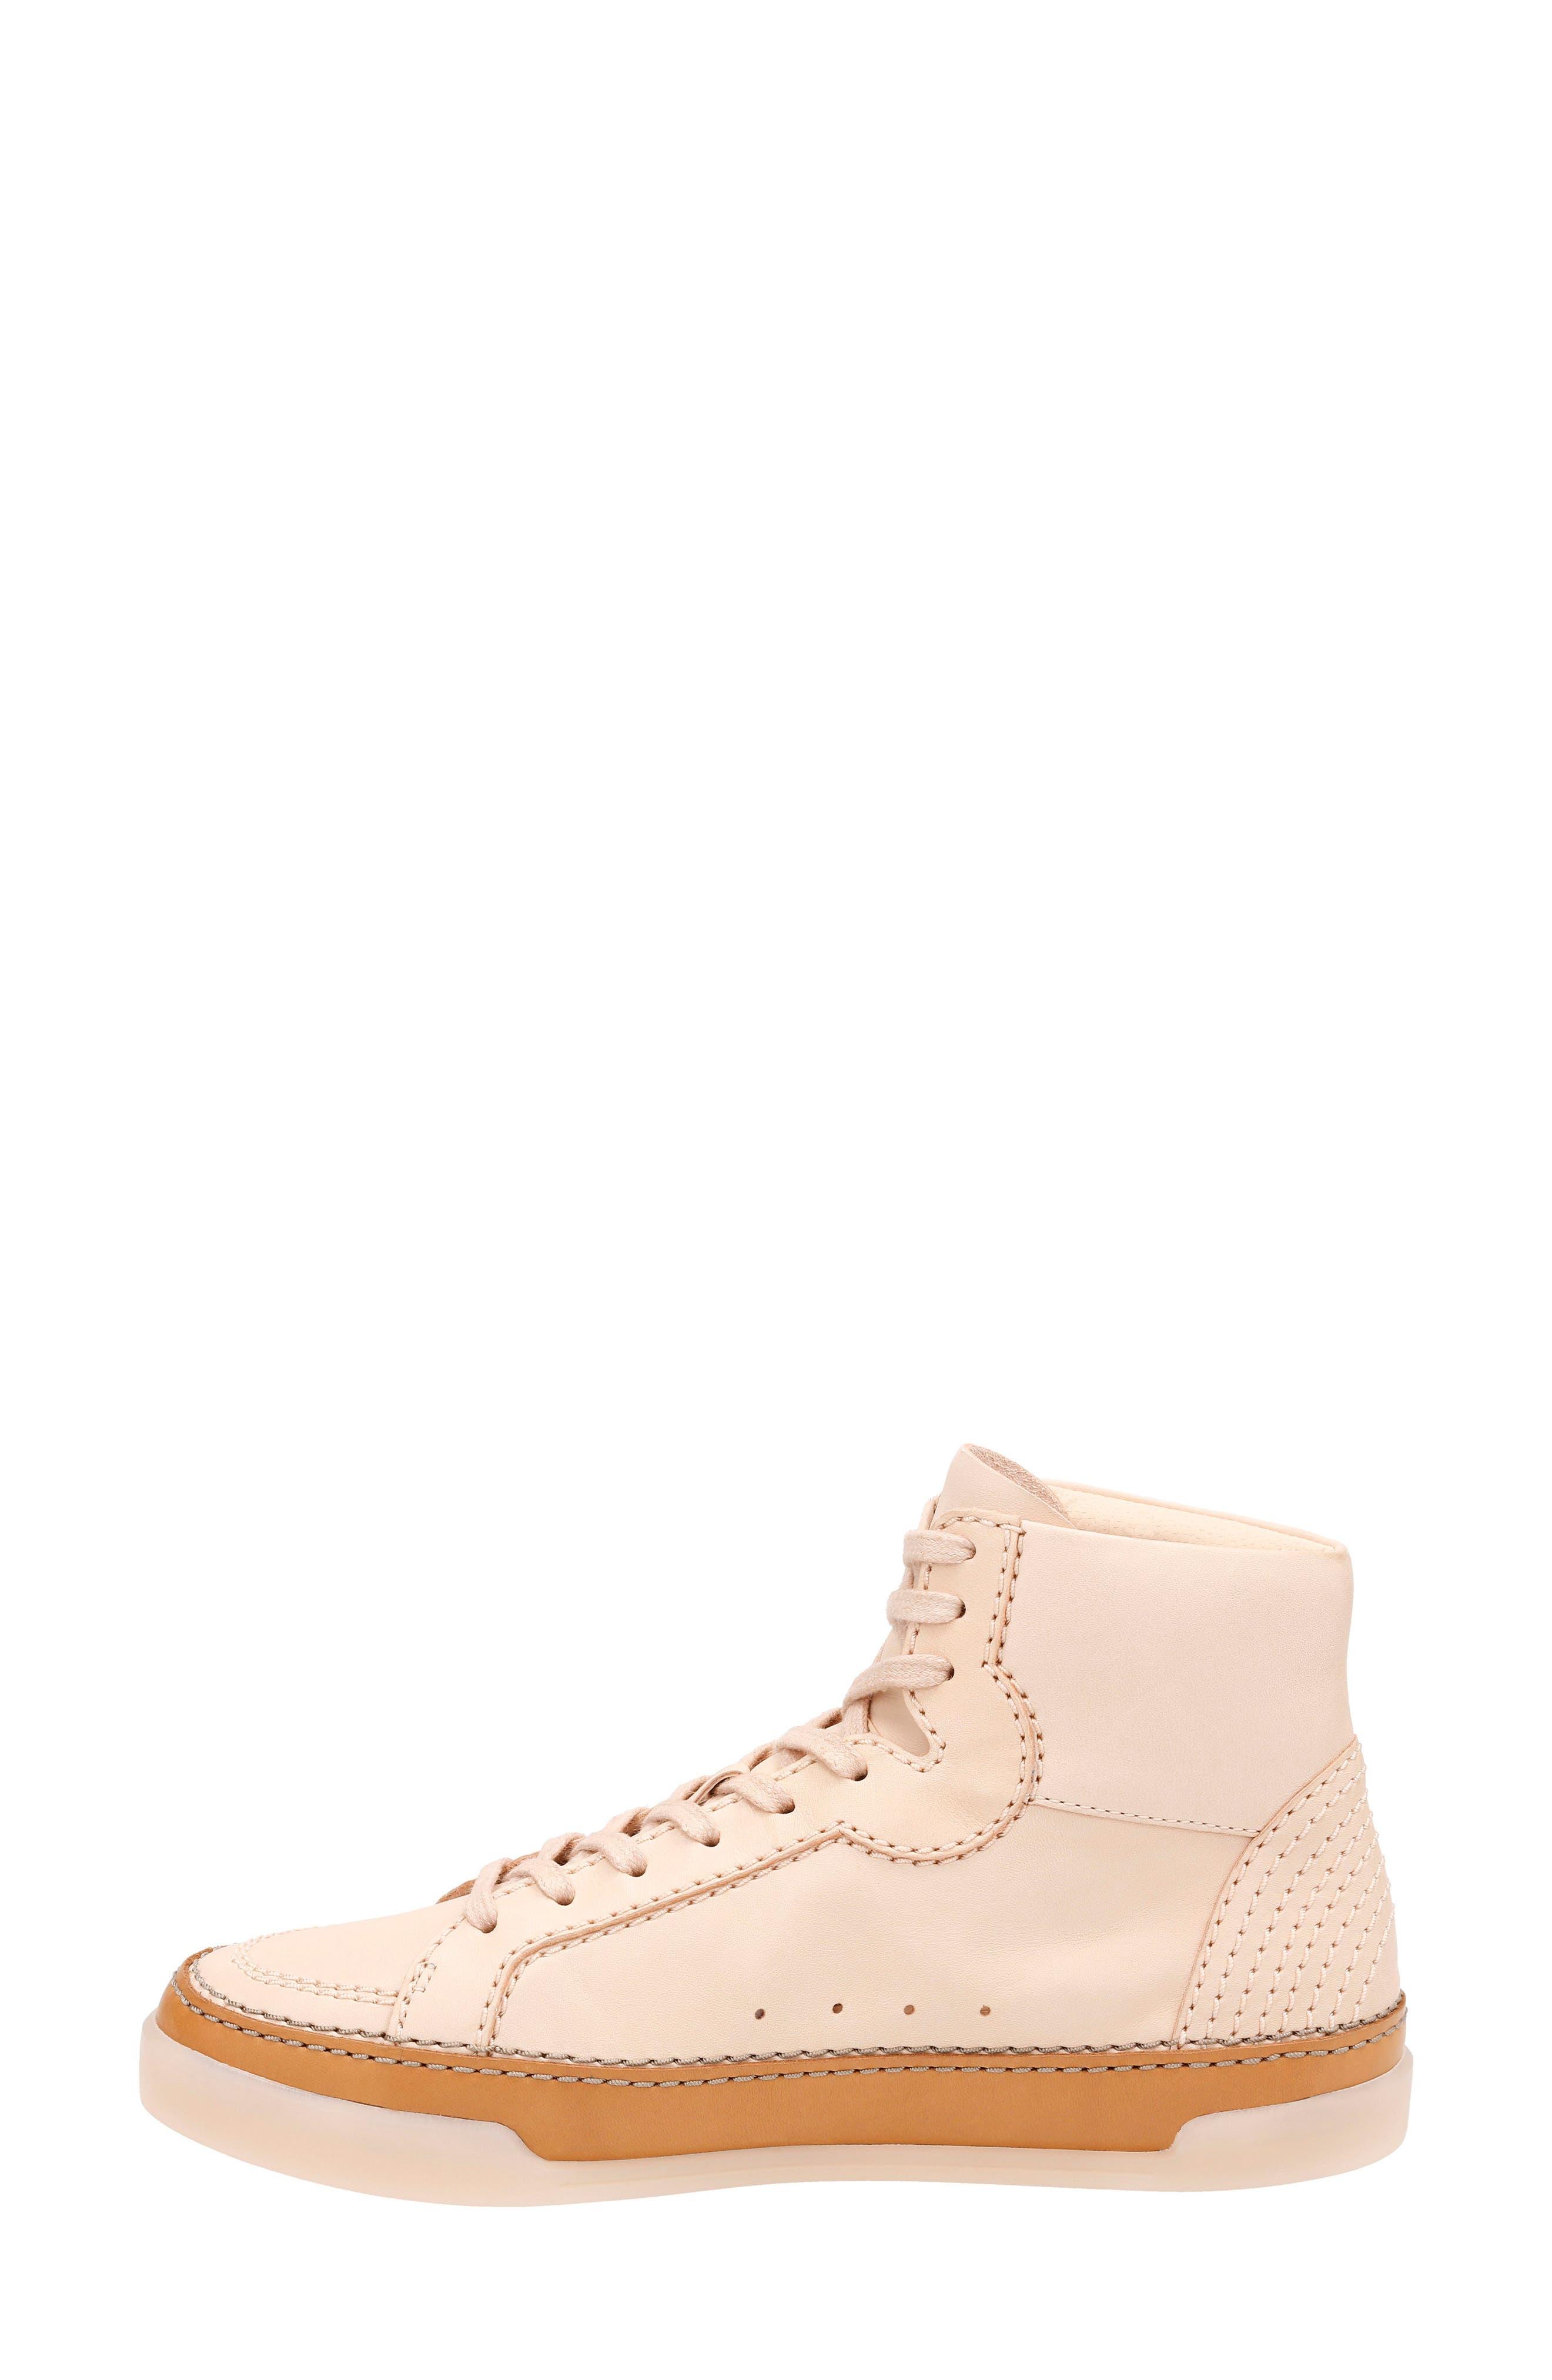 Hidi Haze High Top Sneaker,                             Alternate thumbnail 4, color,